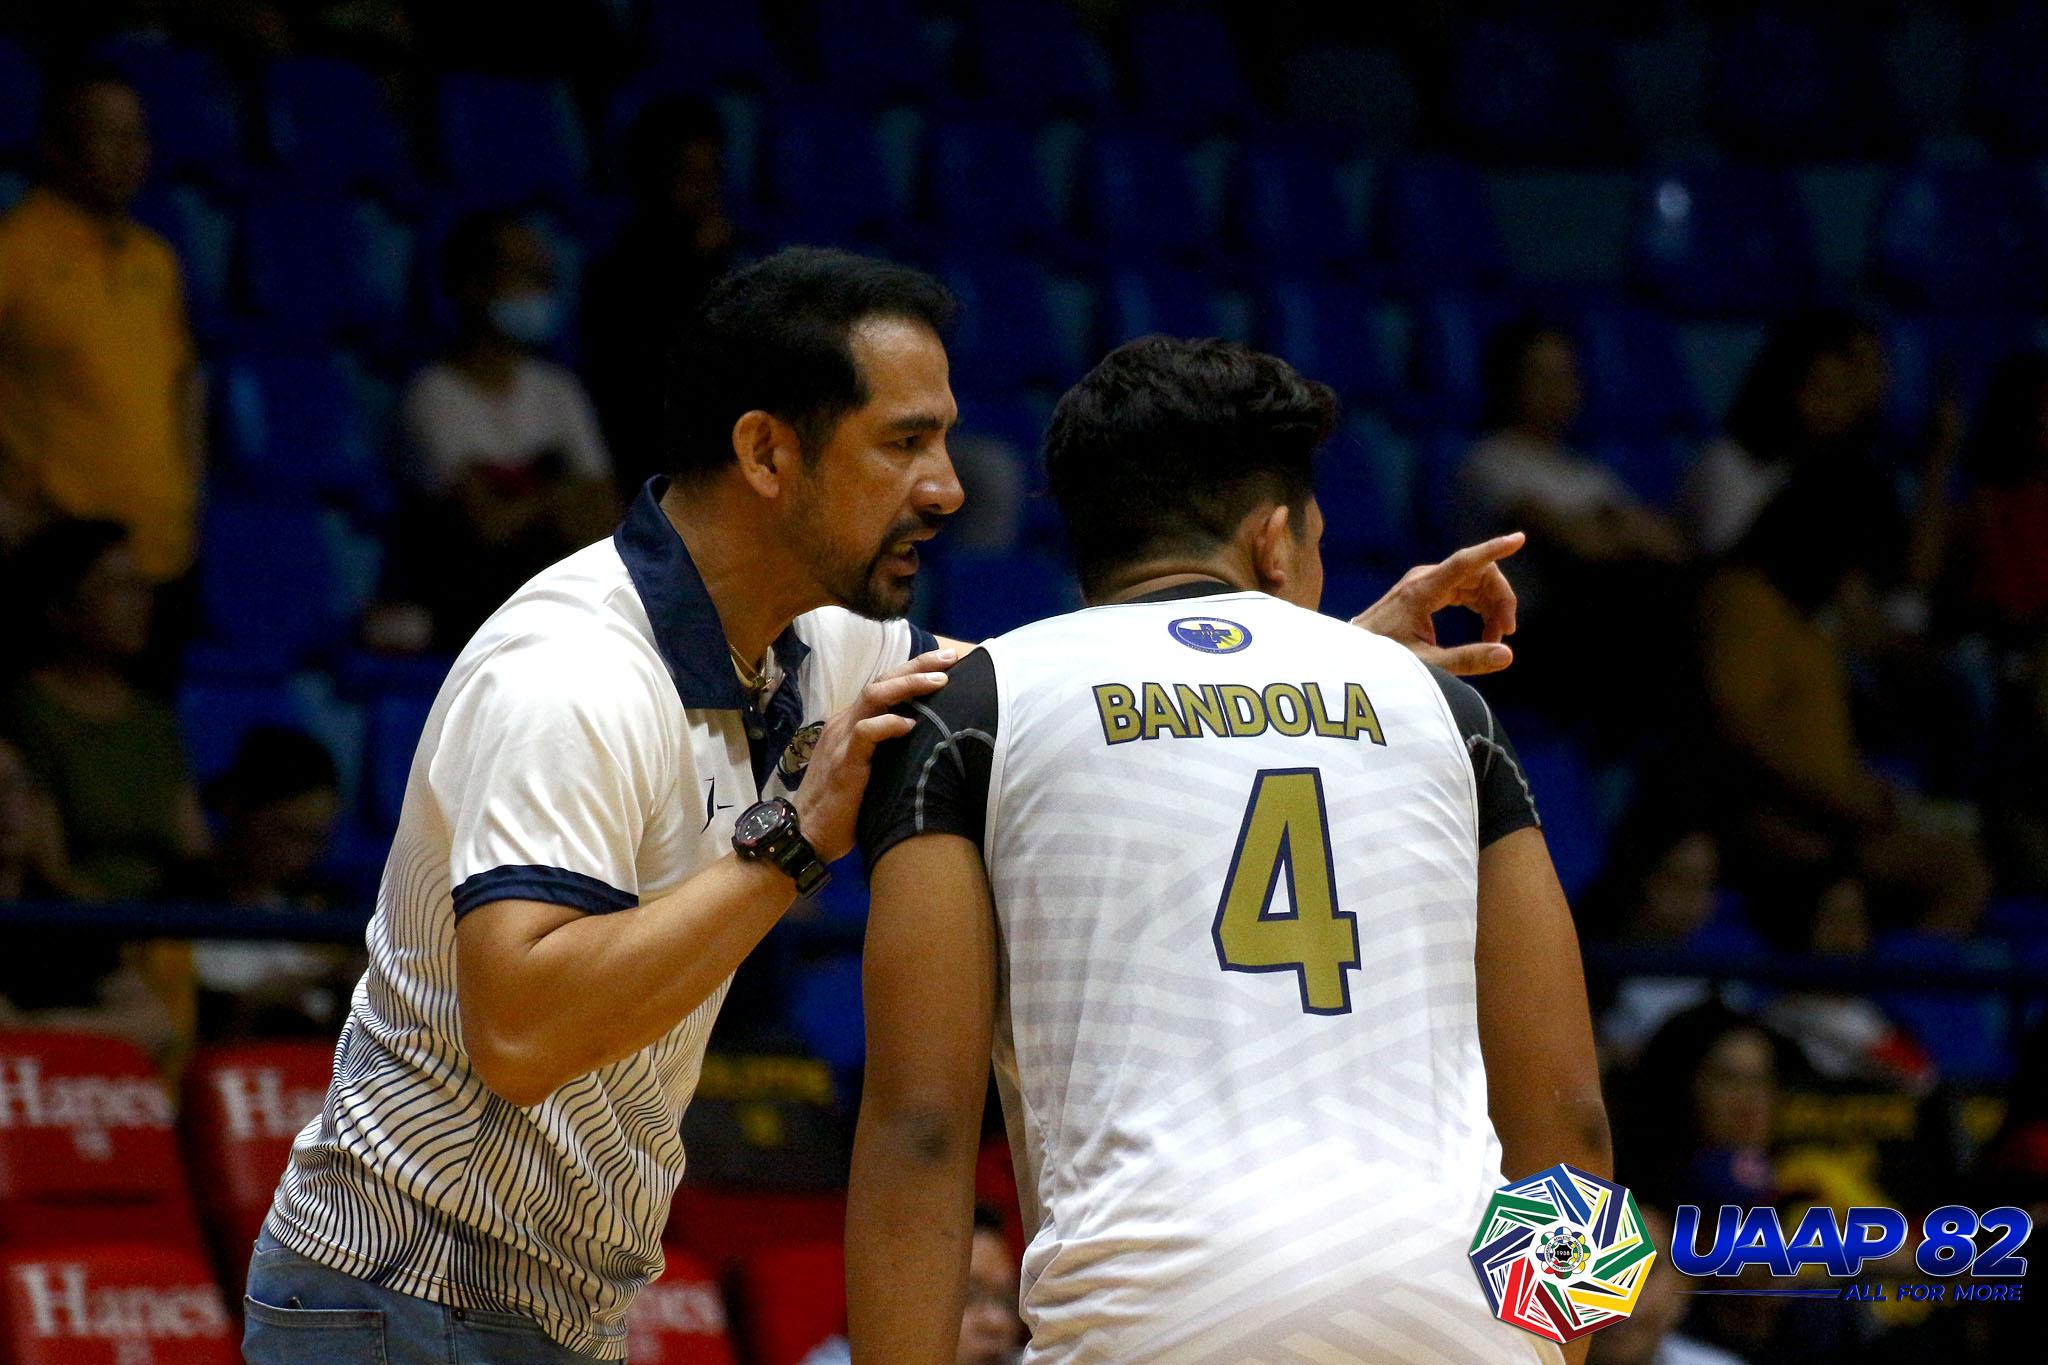 UAAP-82-Boys-Volleyball-Finals-G2-NU-v-FEU-Barroga Edgar Barroga takes over as Sta. Lucia Lady Realtors head coach News PVL Volleyball  - philippine sports news